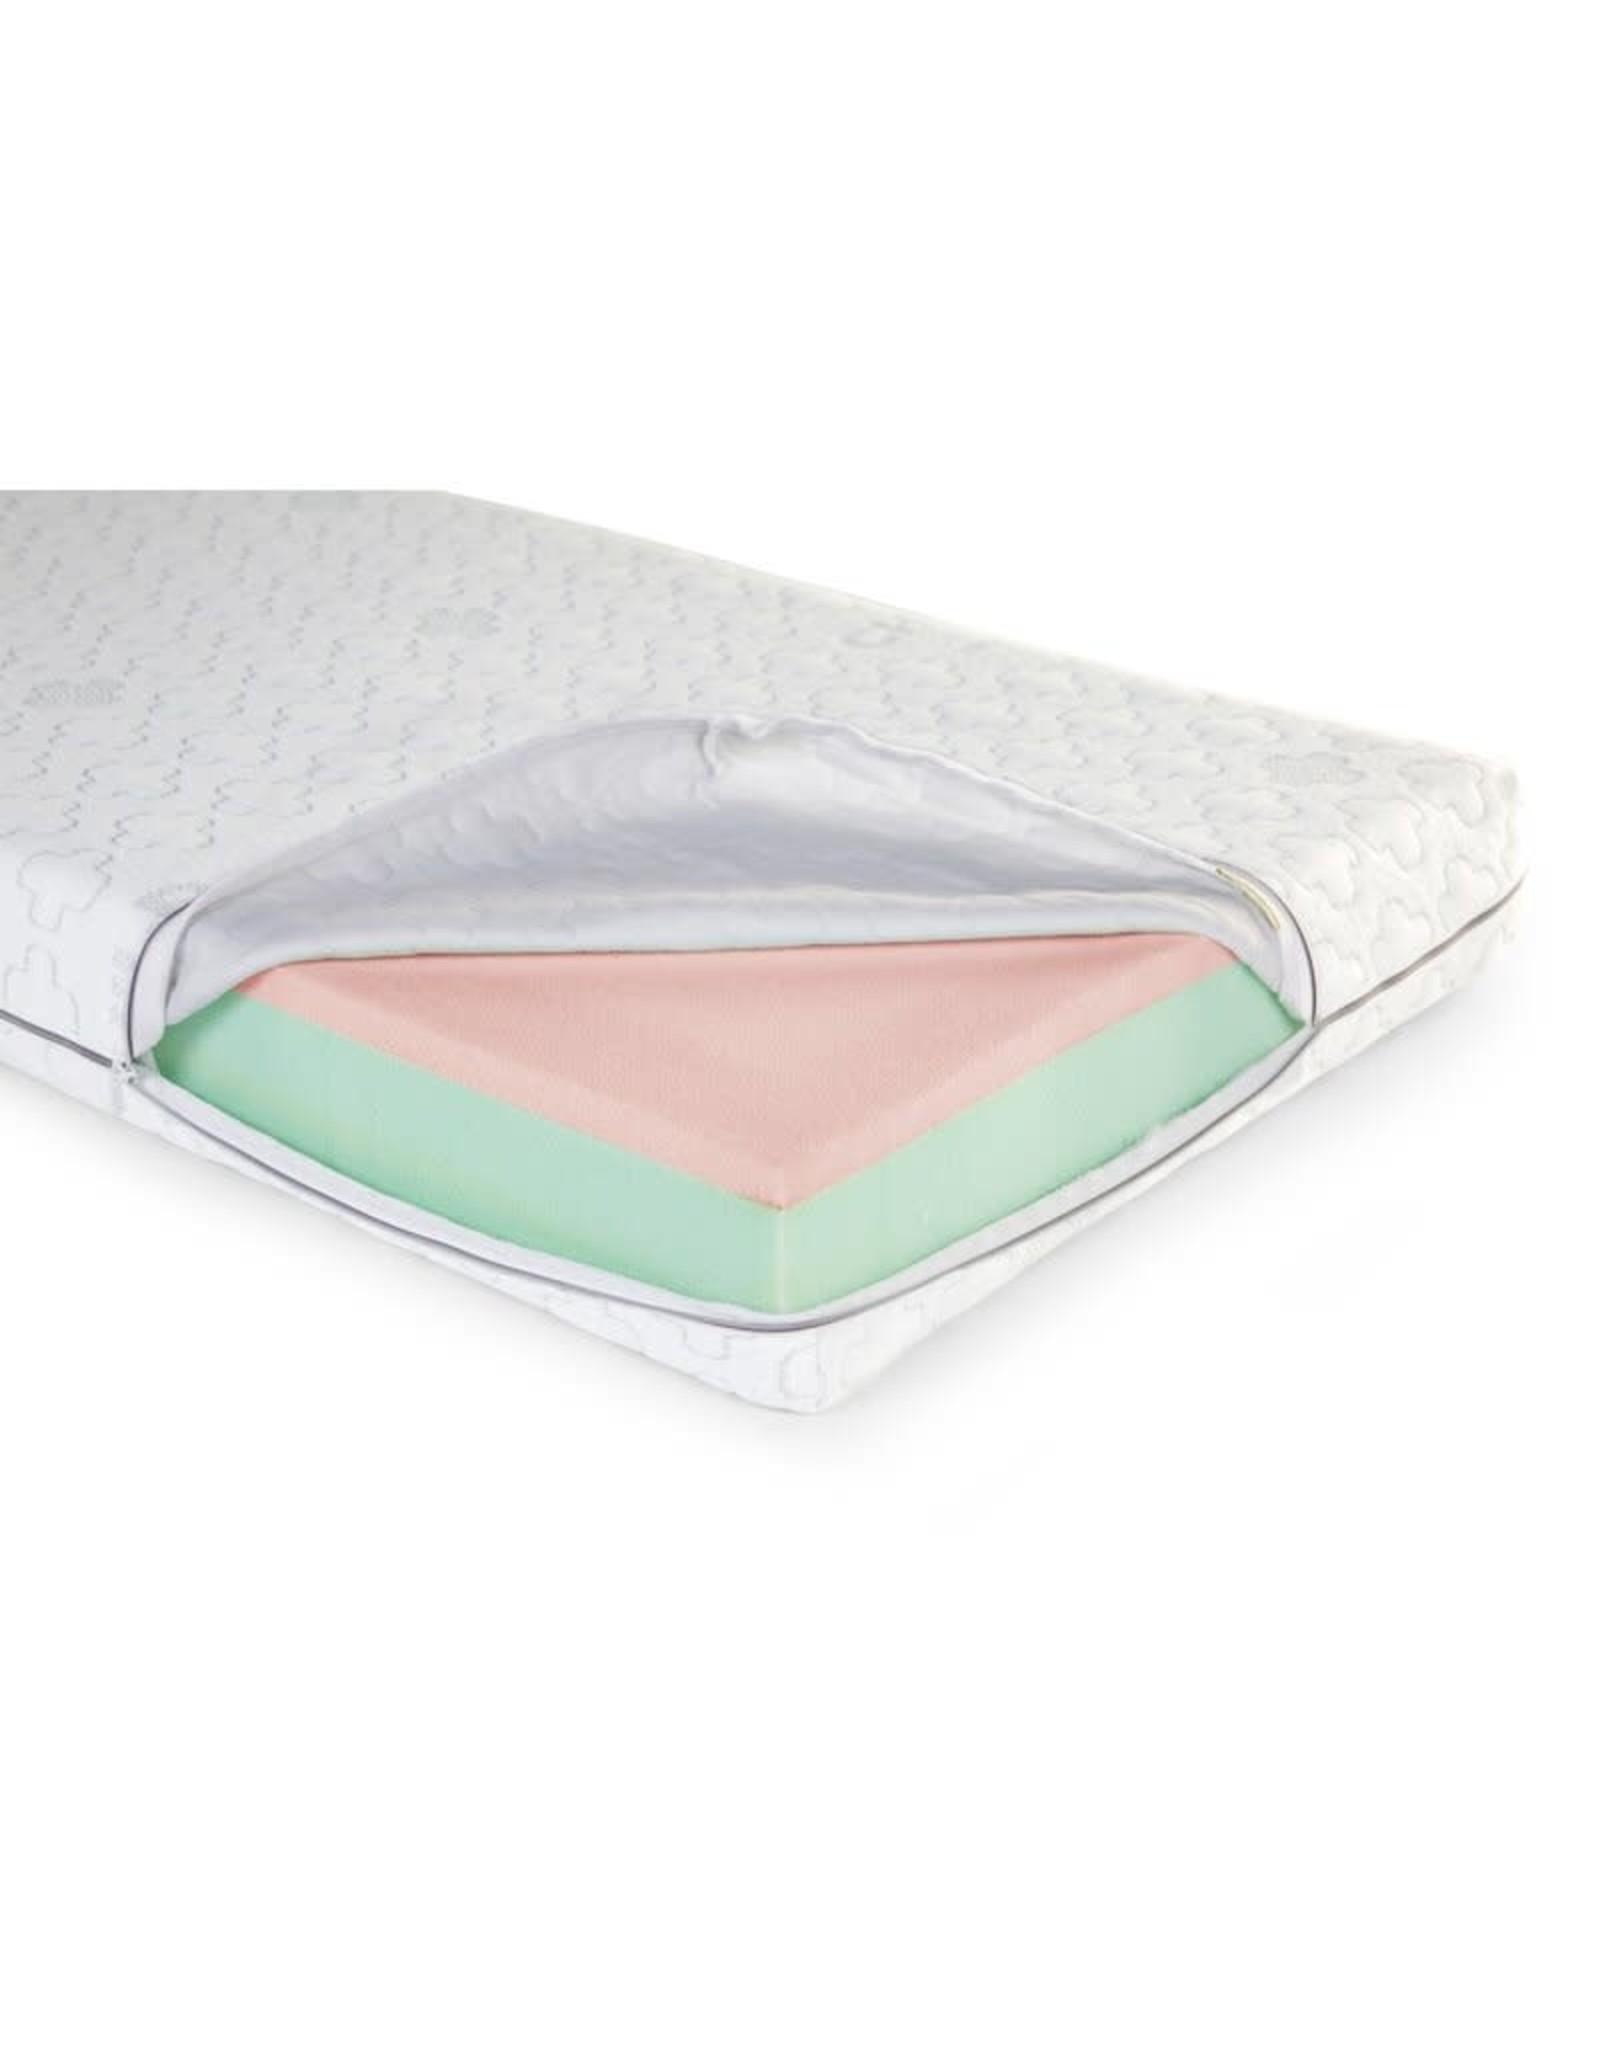 Childhome Childhome Medical Antistatic Safe Sleeper Matras - 70x140x12 Cm